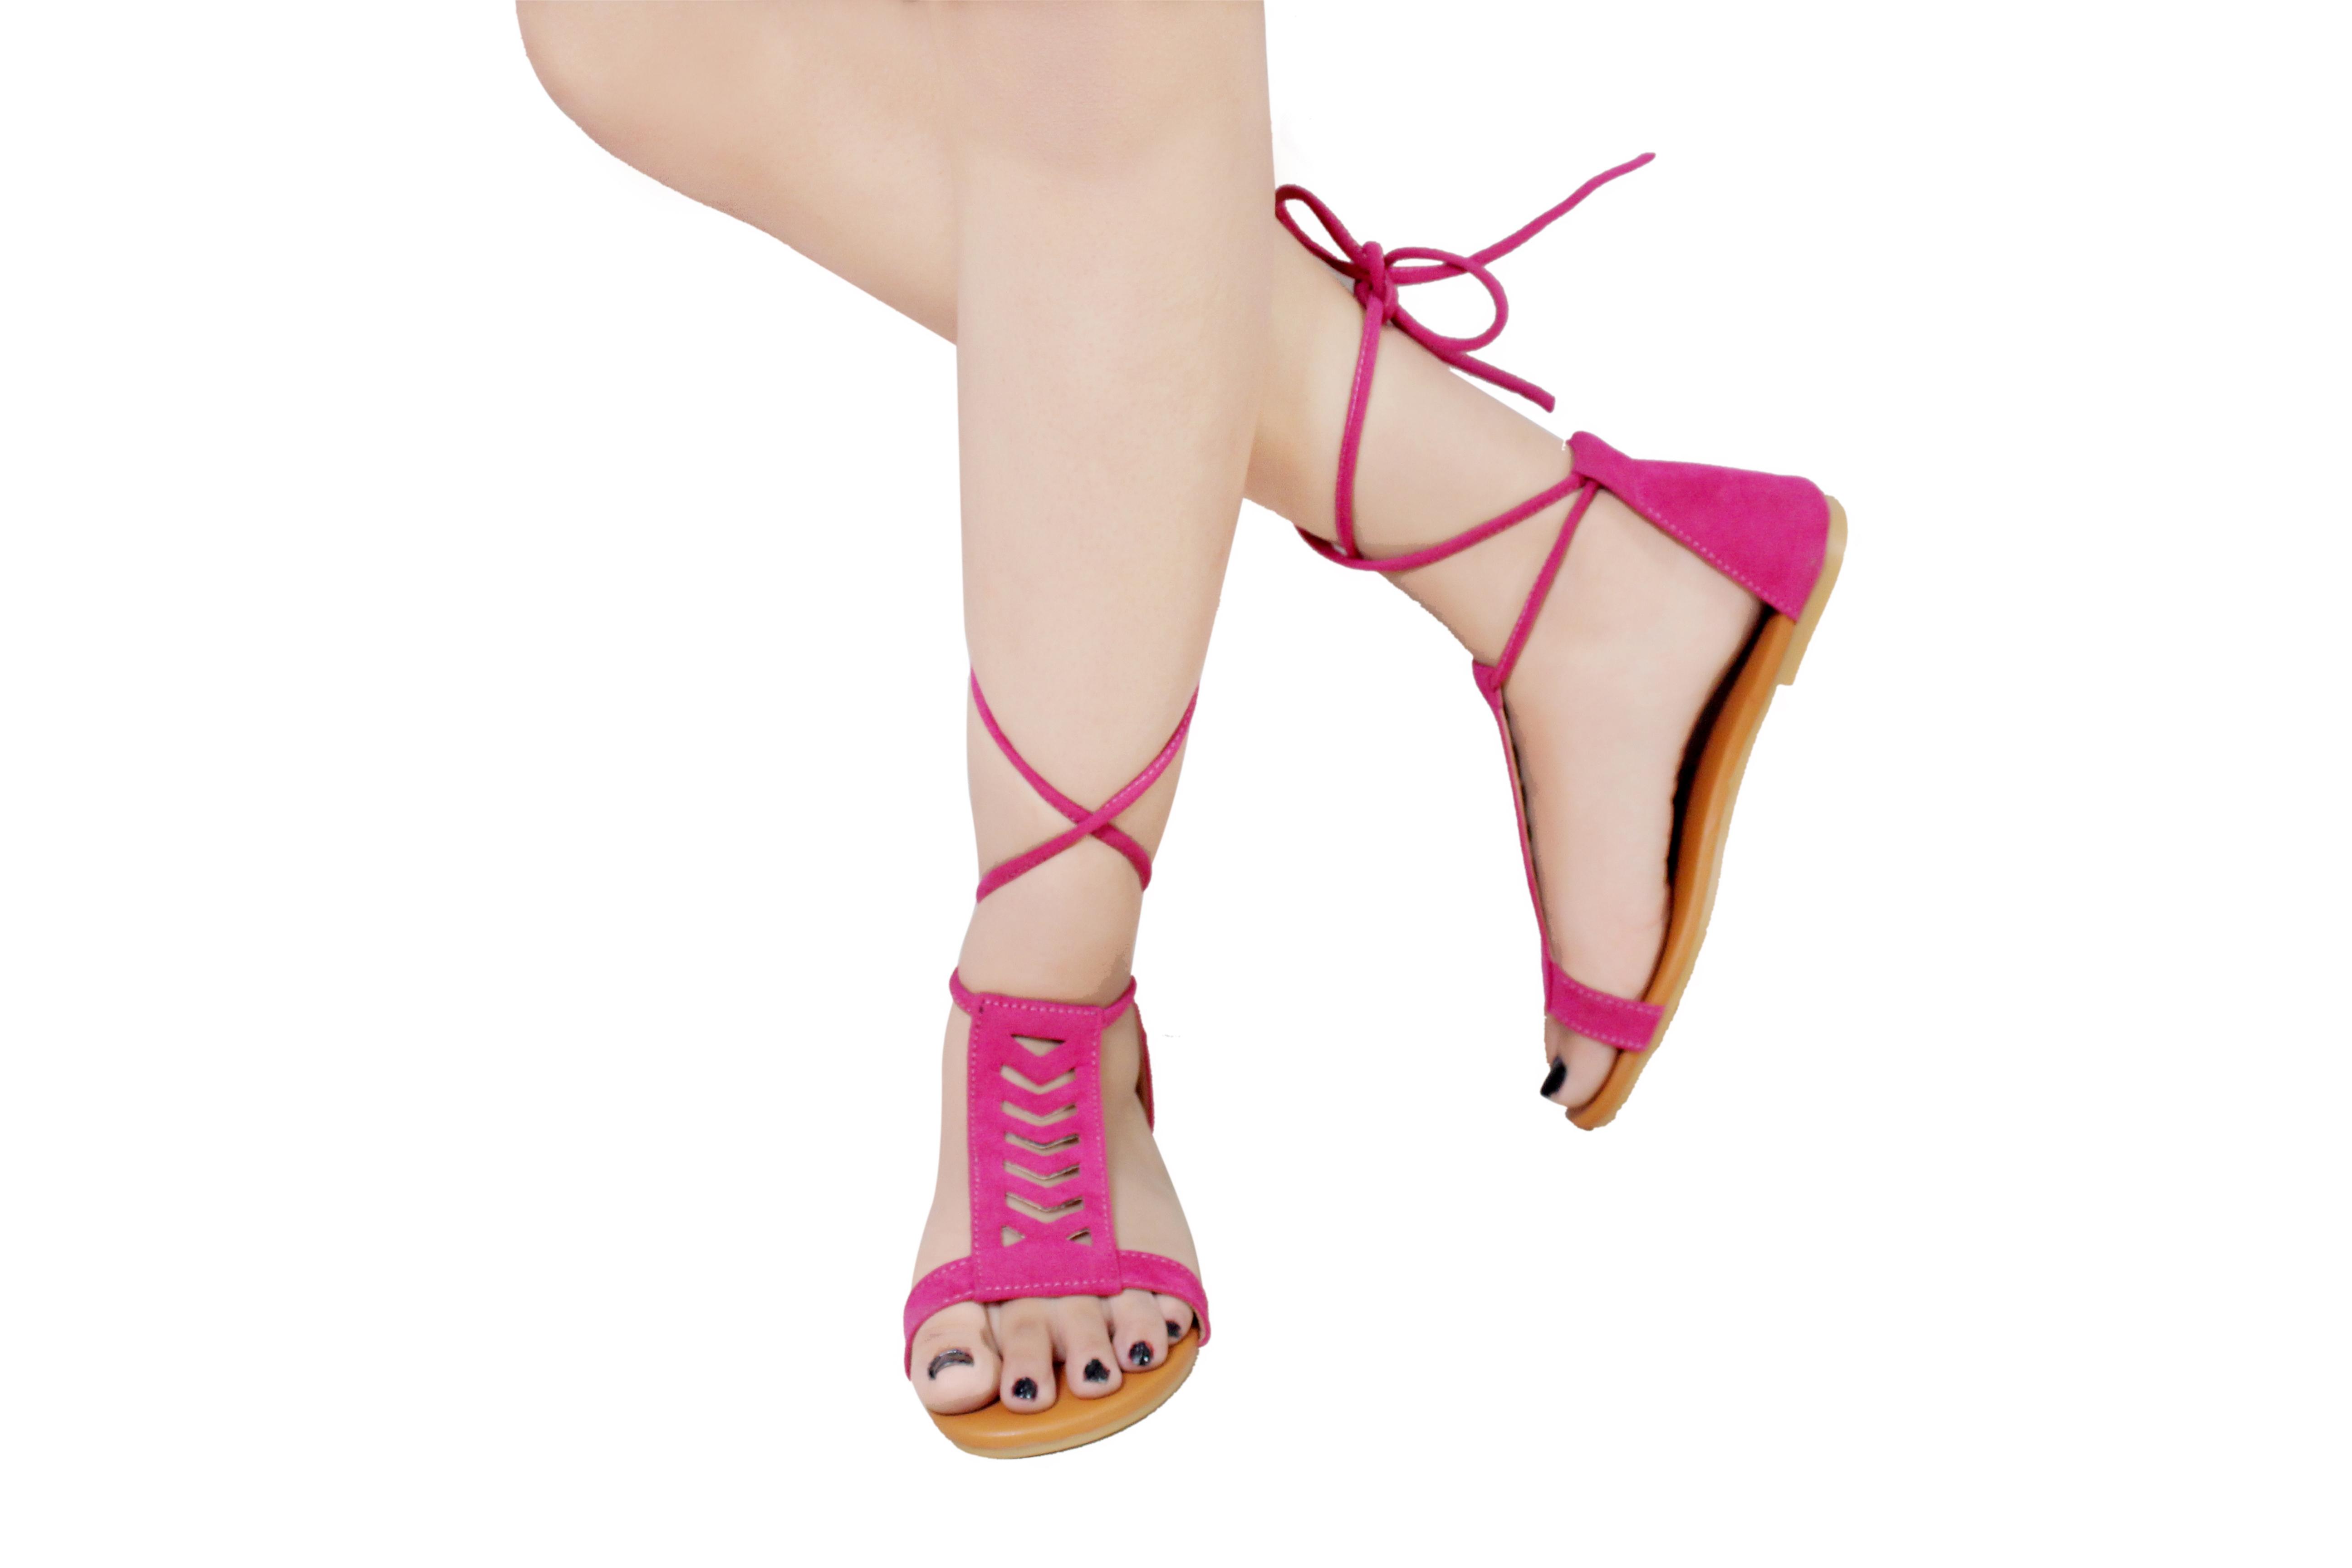 Gibelle Fancy Women's Pink Flat Sandals GWF-010-PN (Pink, 36-40, 5 PAIR)